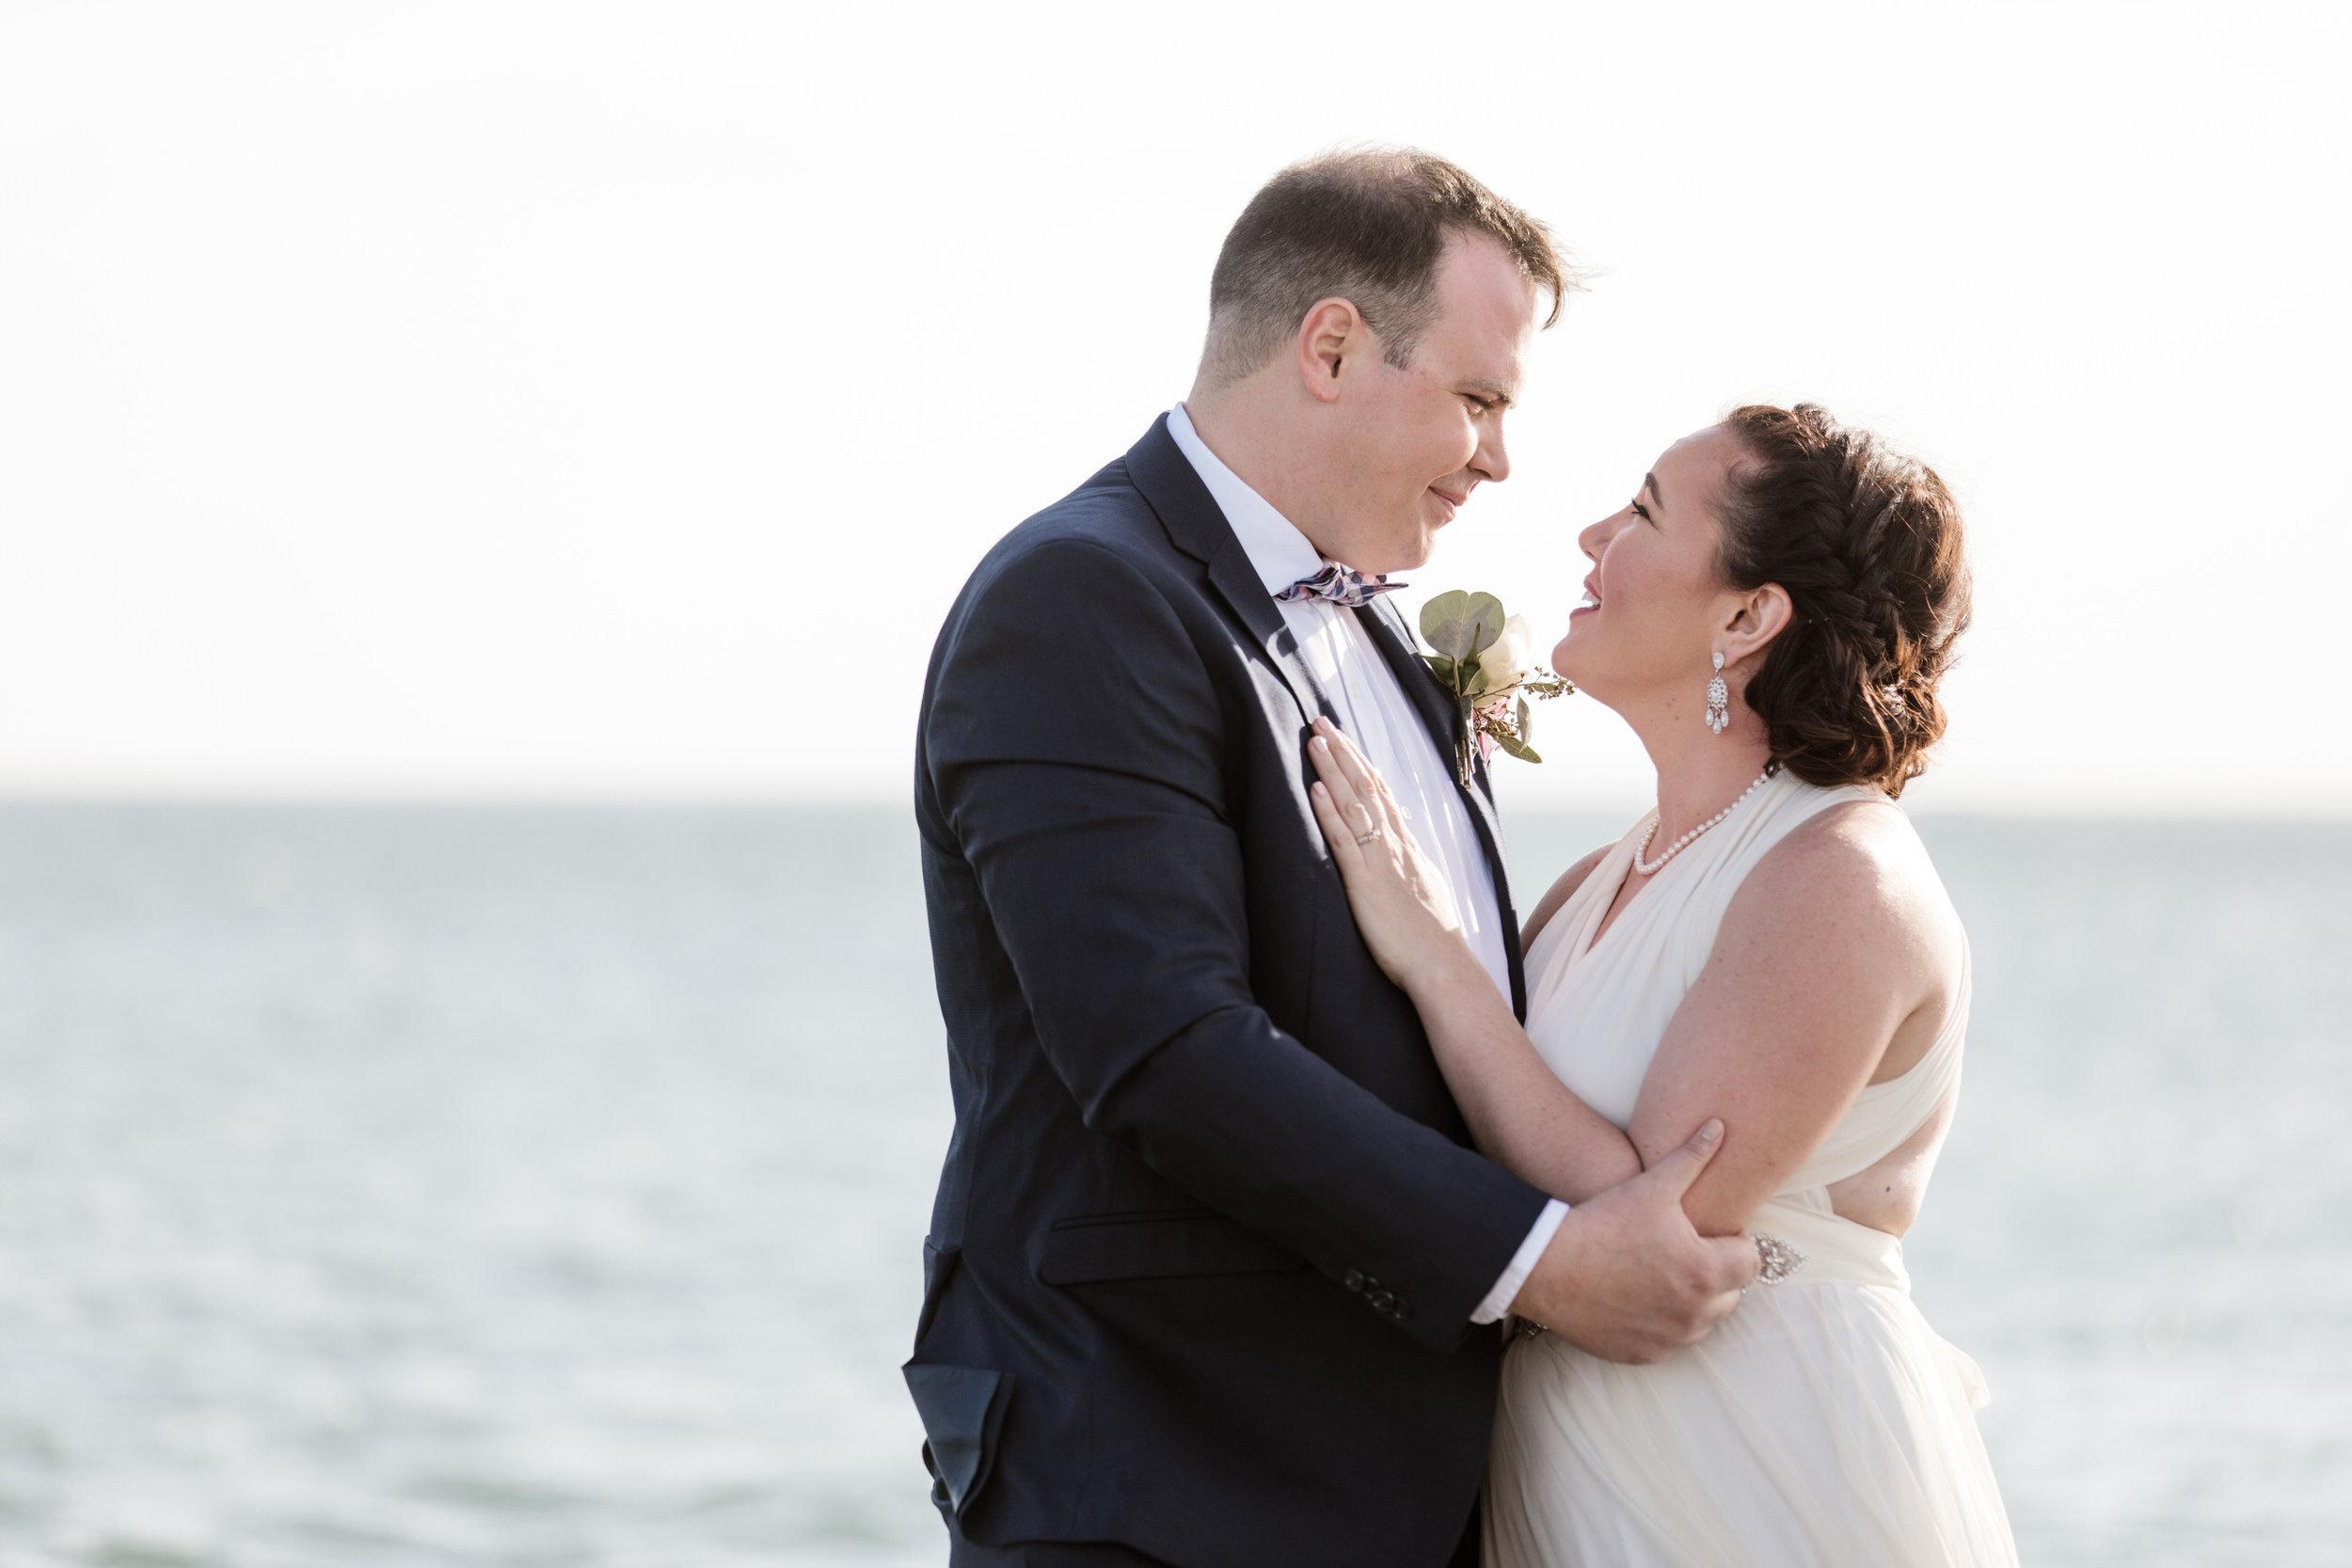 Beltran_Treasure_Island_Elopement_Tampa_Wedding_036-1.jpg